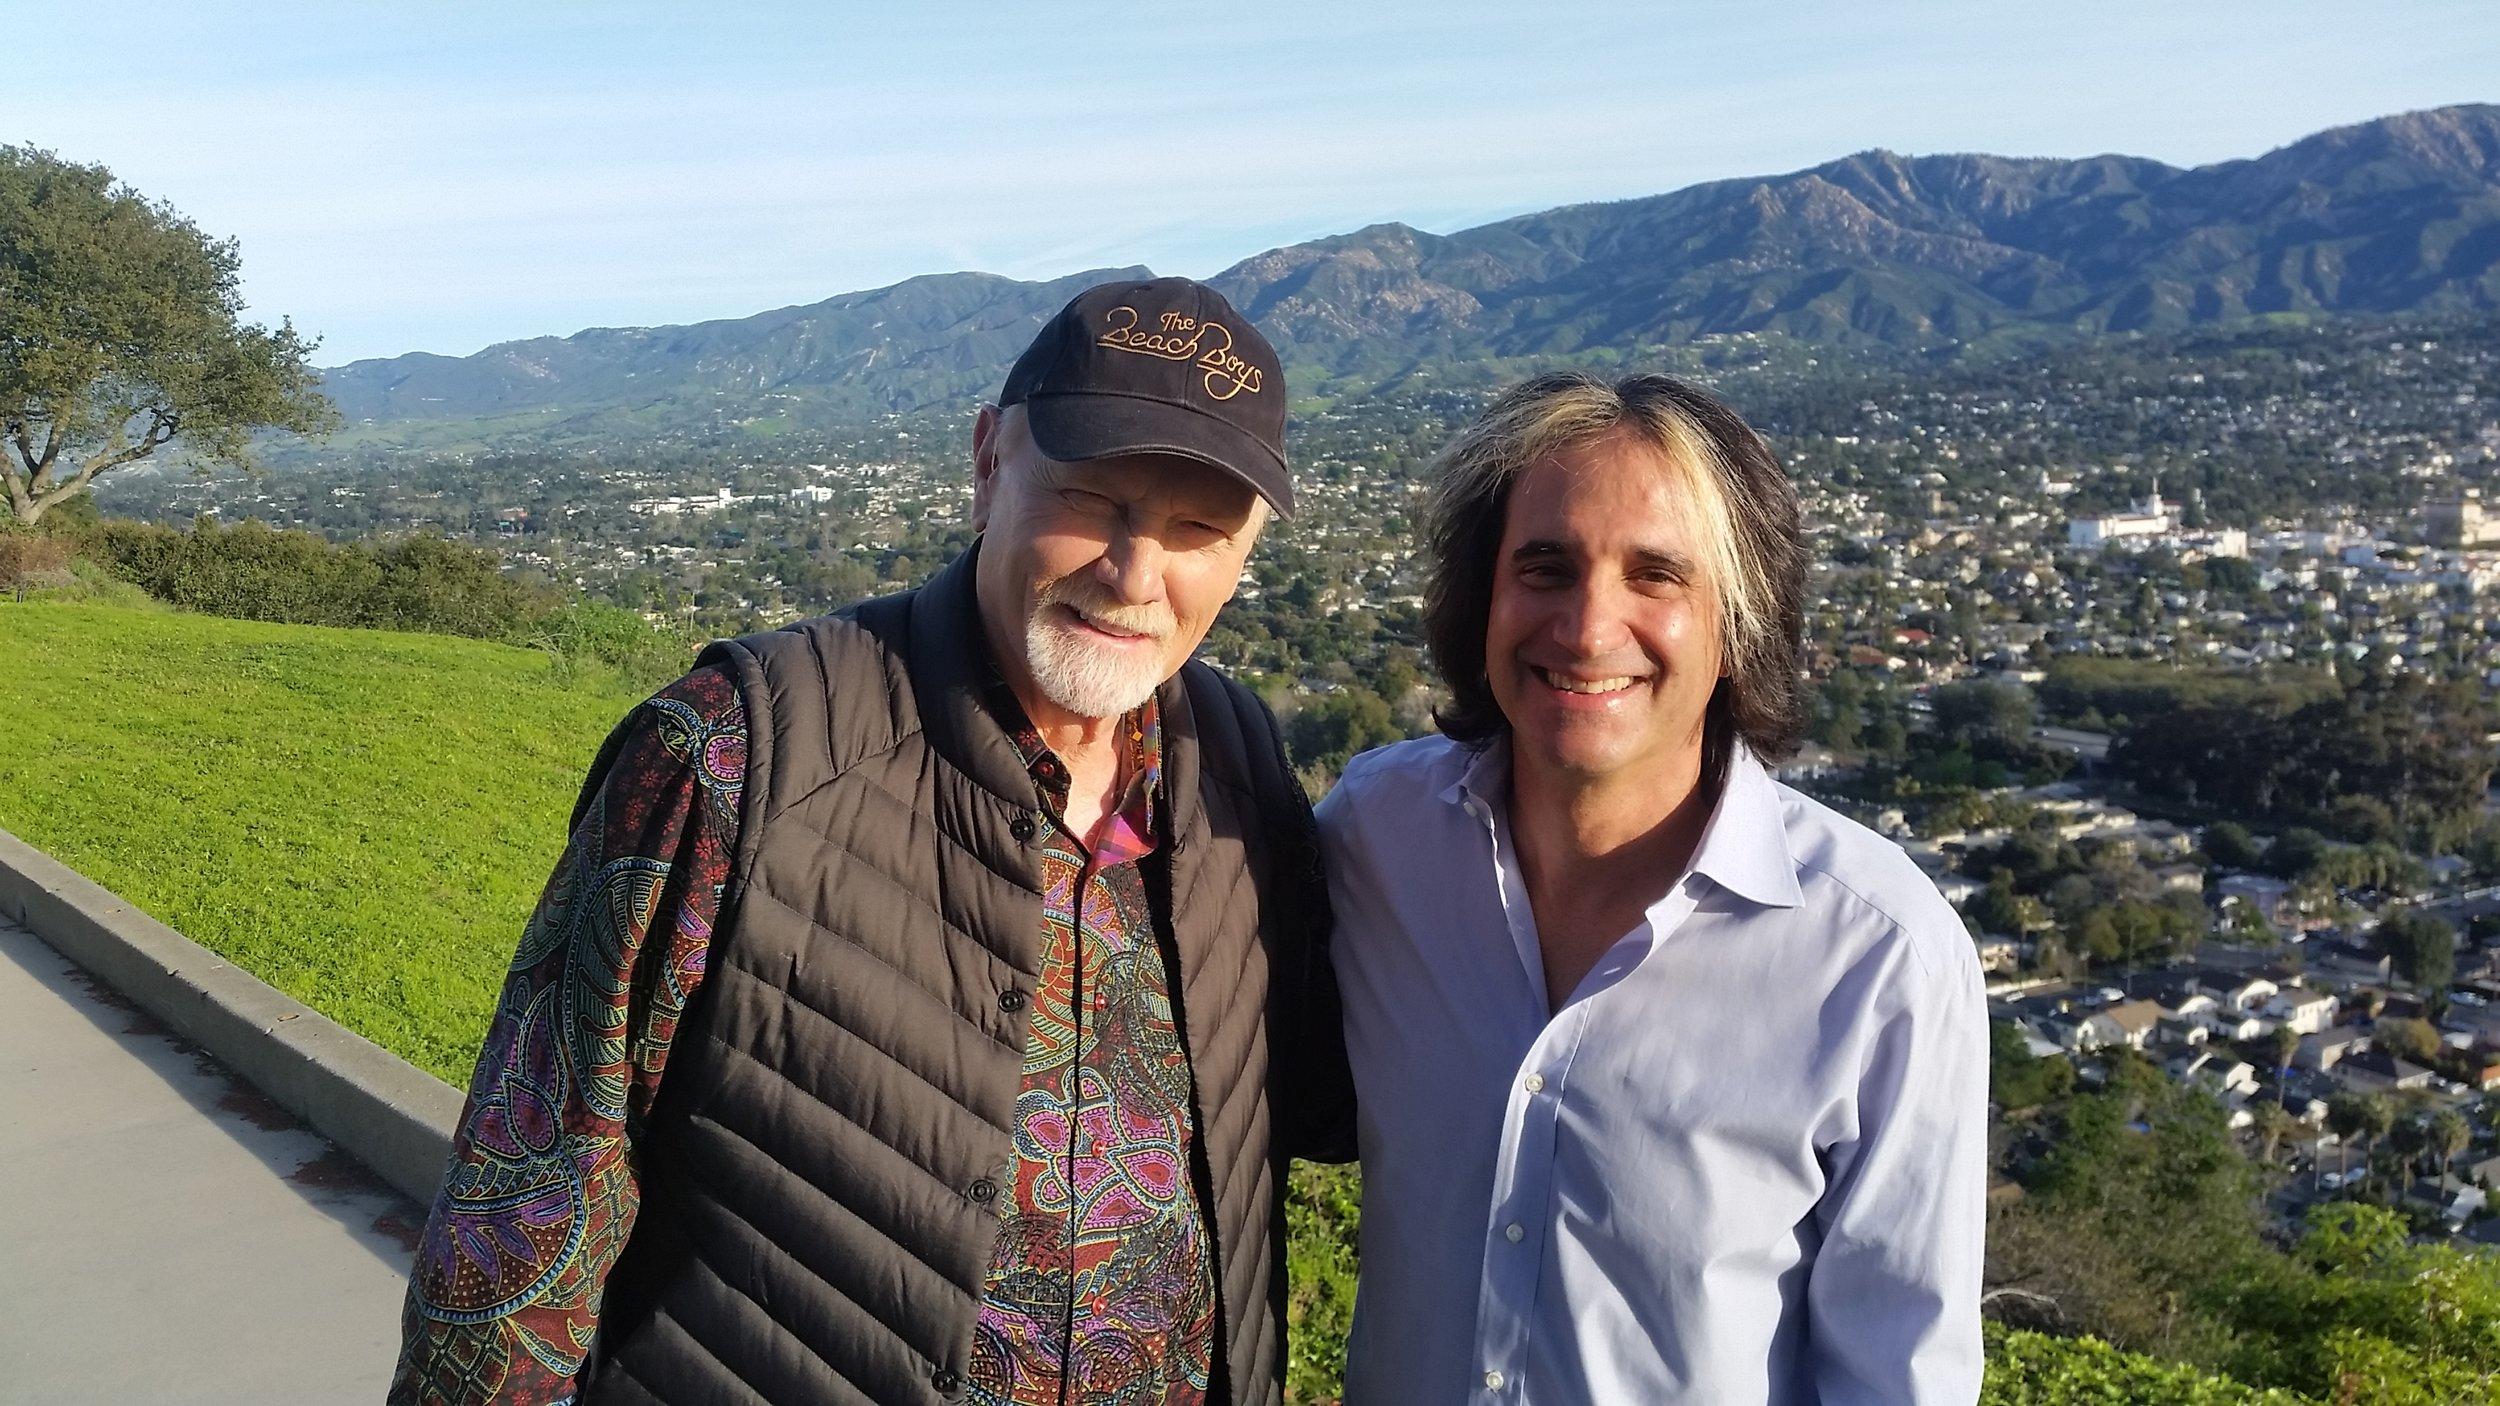 Mike Love of the Beach Boys at KEYT Santa Barbara